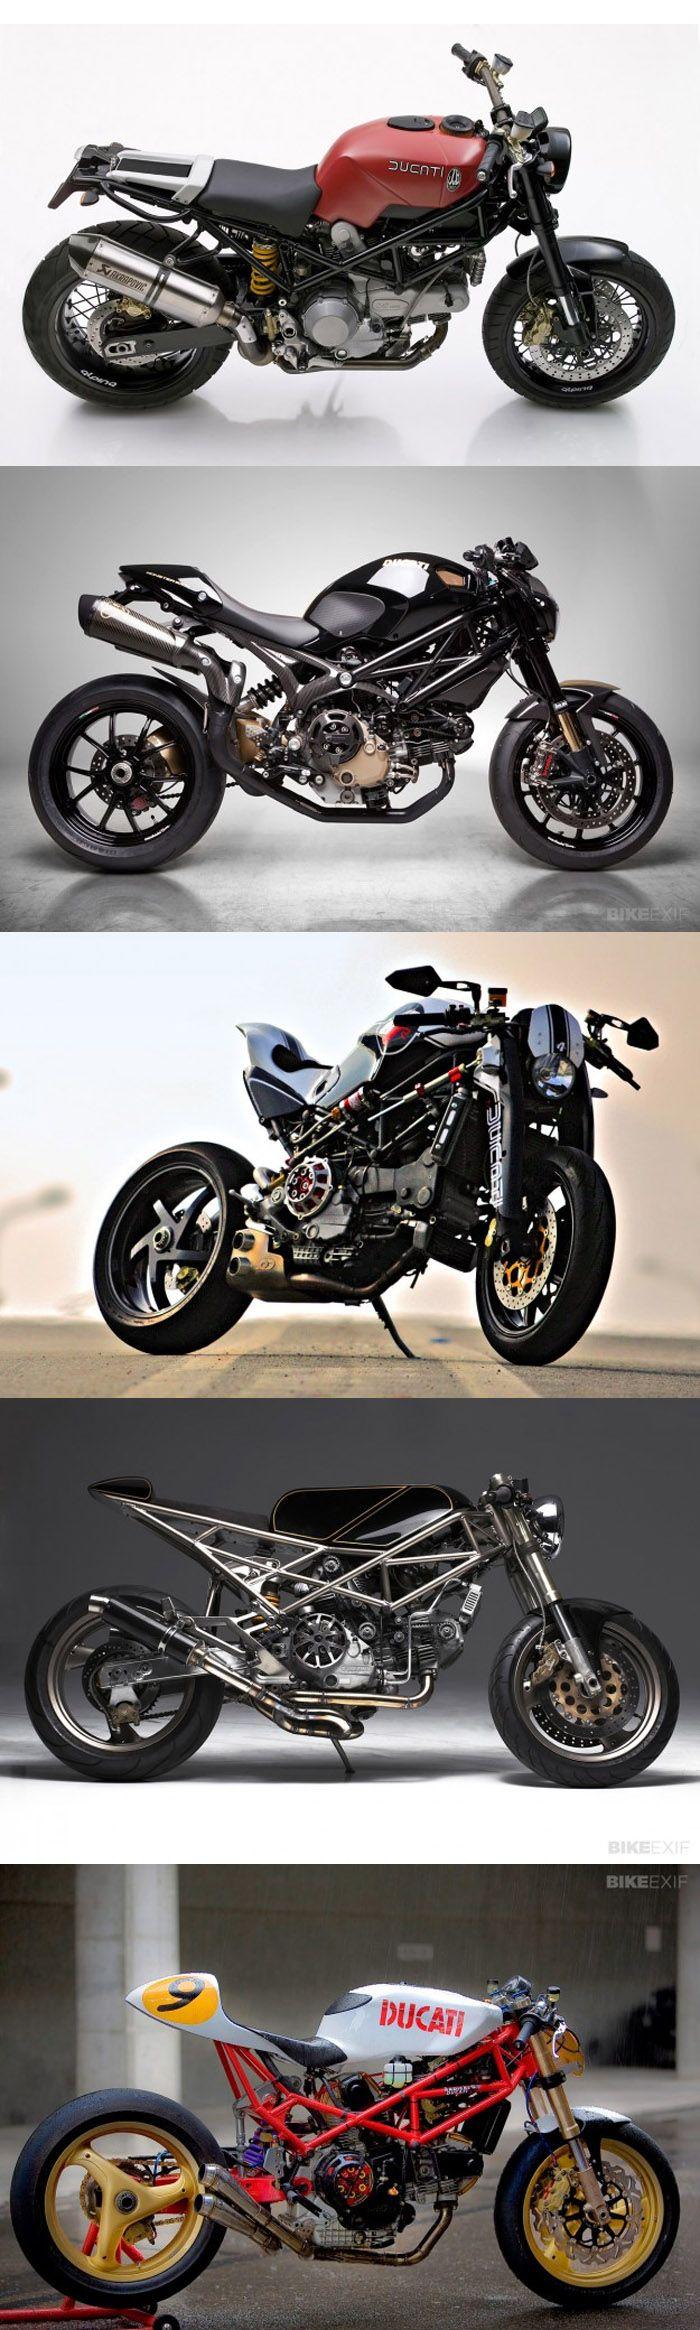 BIKE-EXIF :: top 5 Ducati Monster Customs   http://www.bikeexif.com/top-5-ducati-monsters